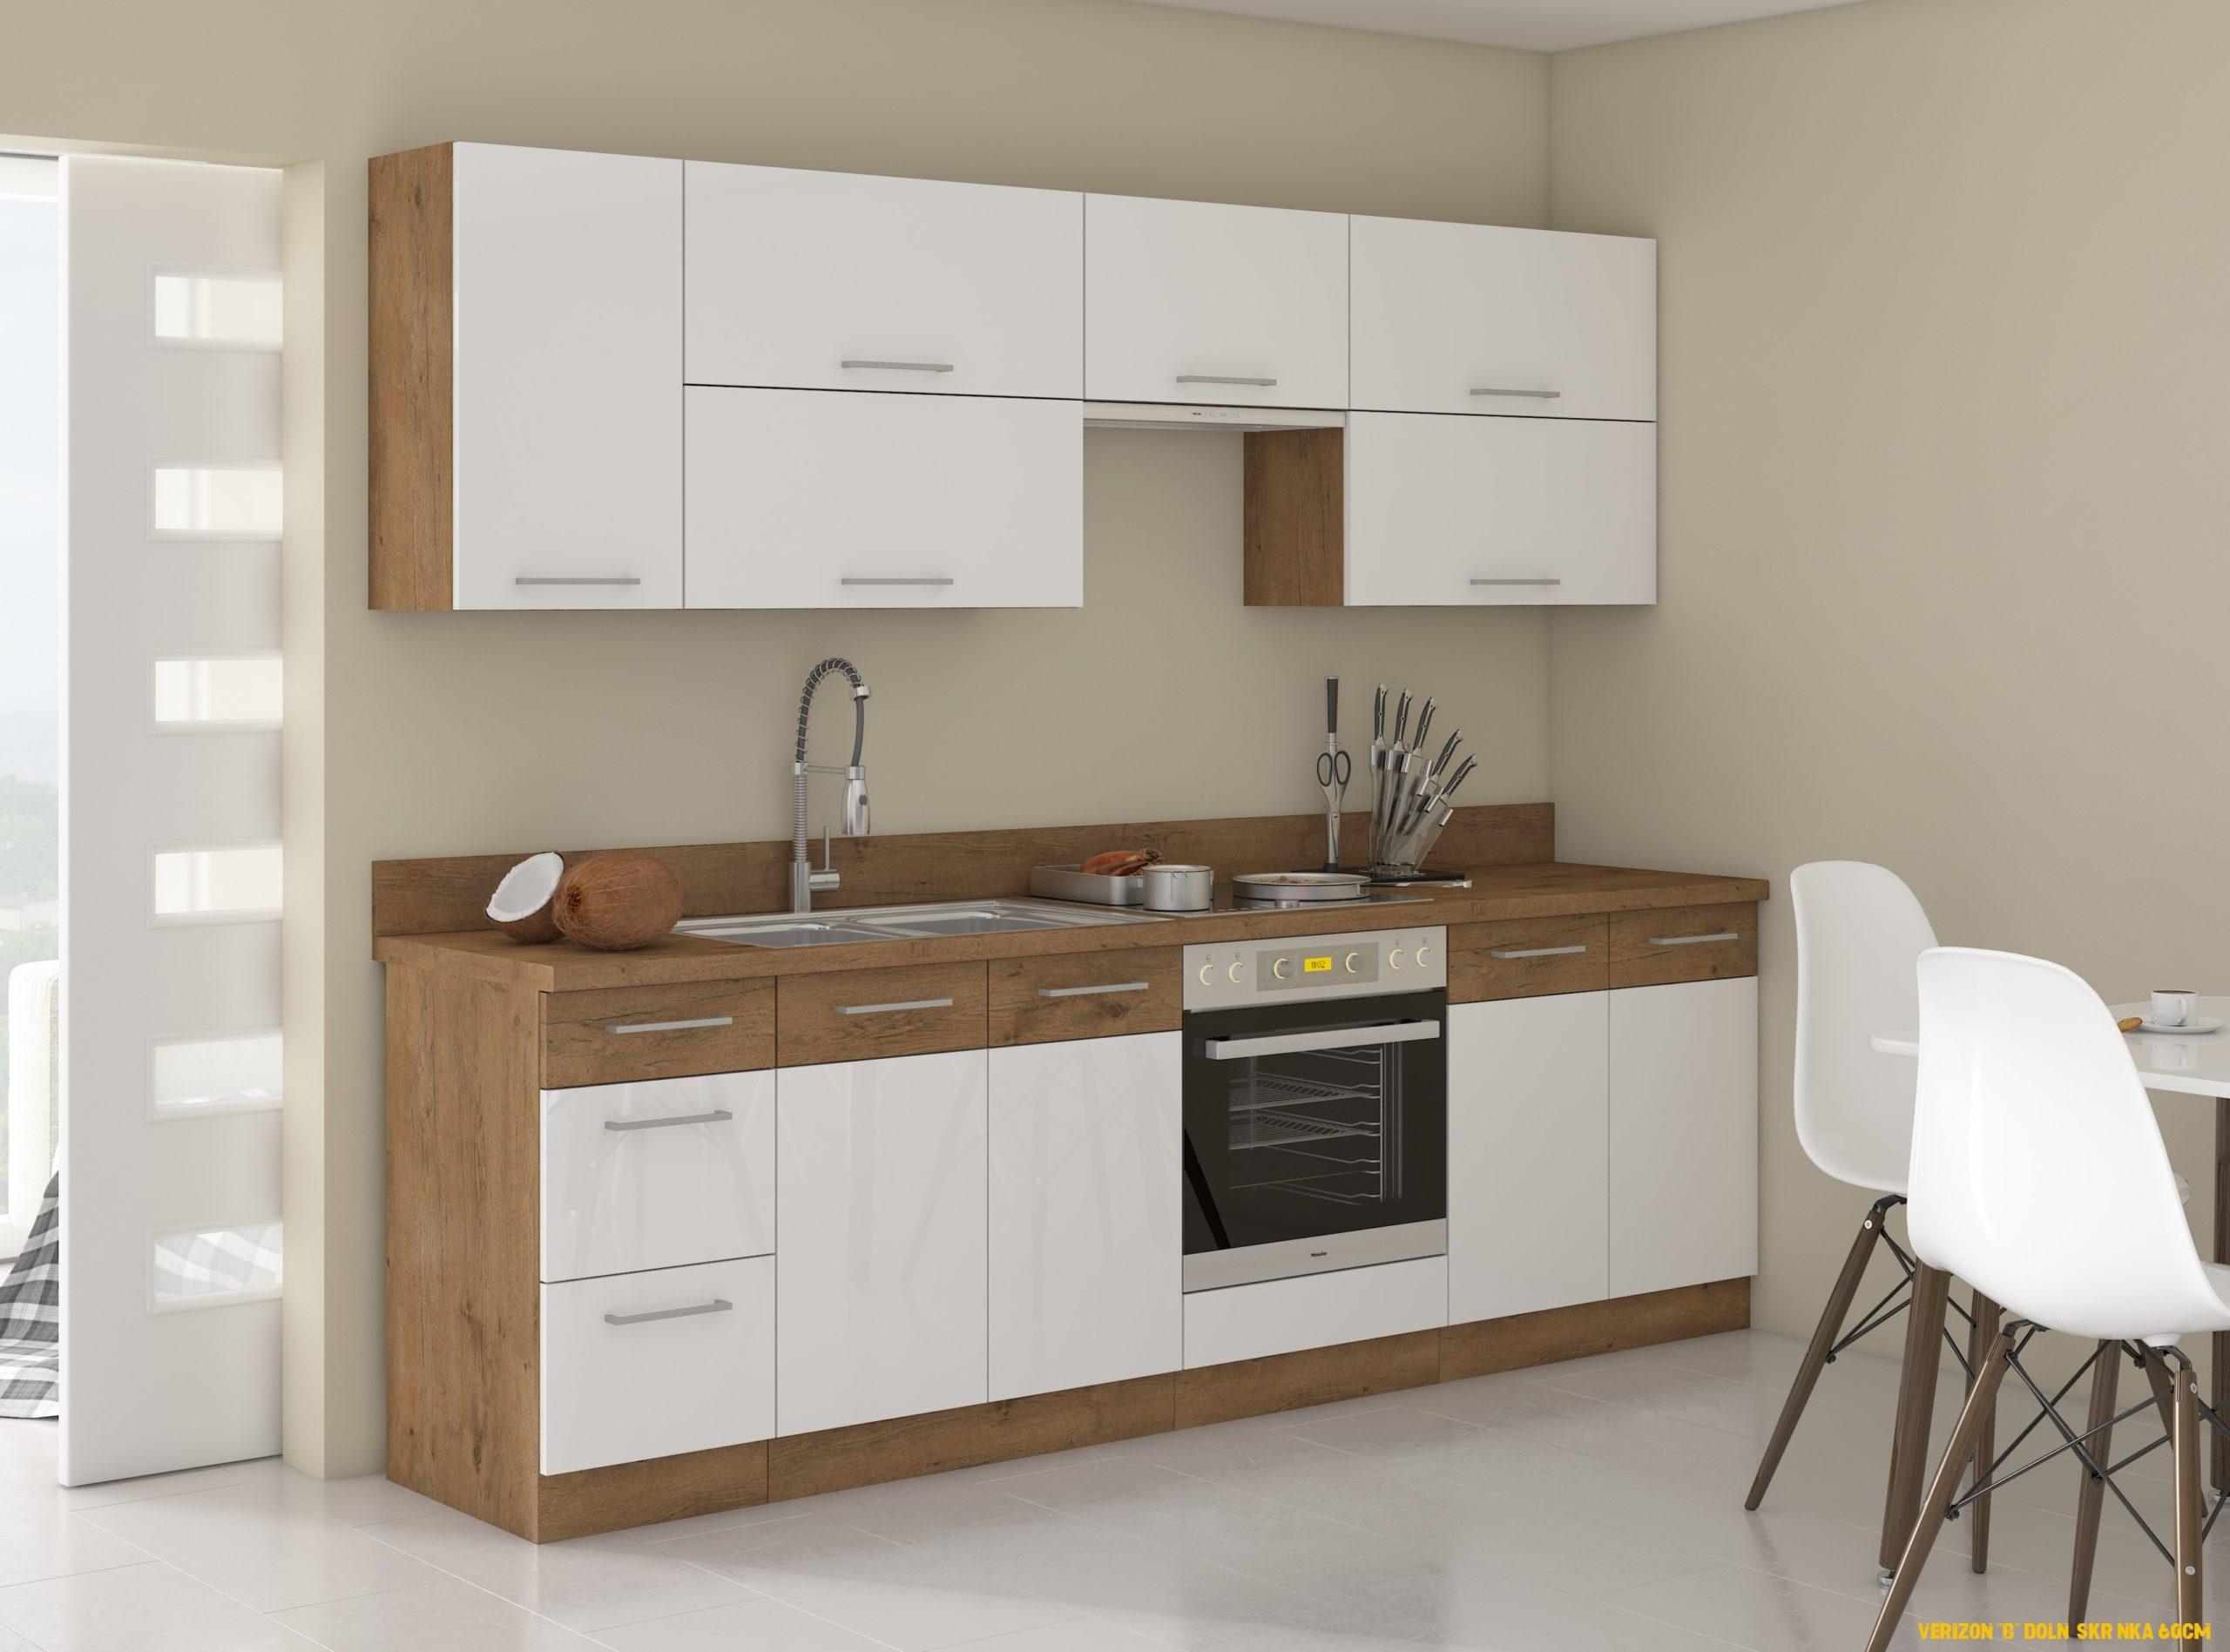 Kuchyne 4cm levně | Mobilmania zboží